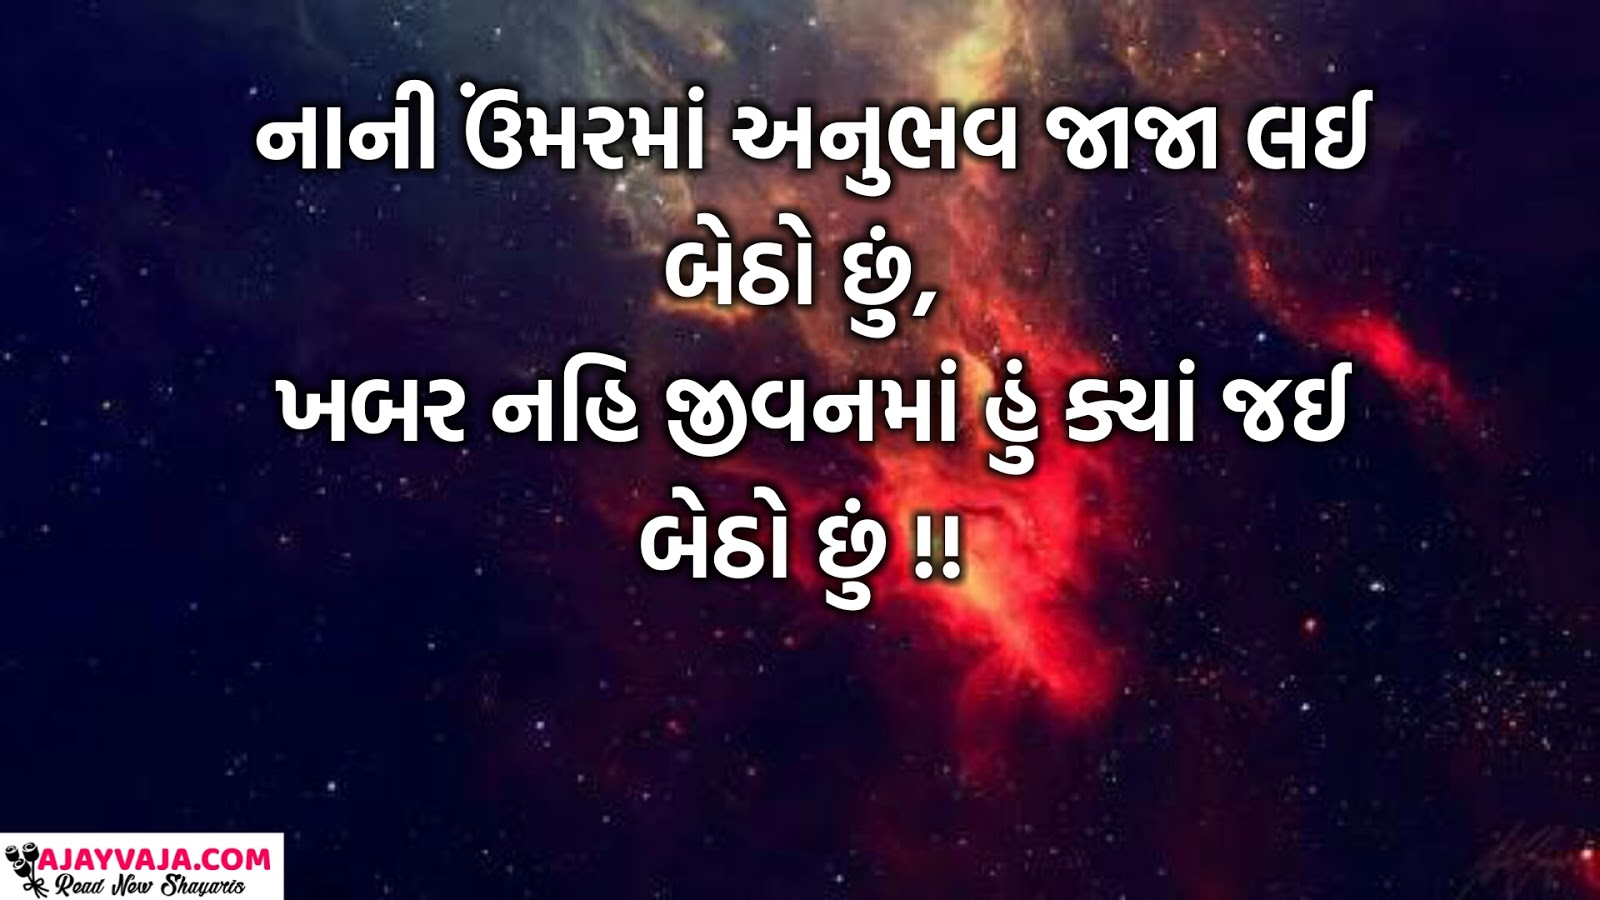 Gujarati love shayari images